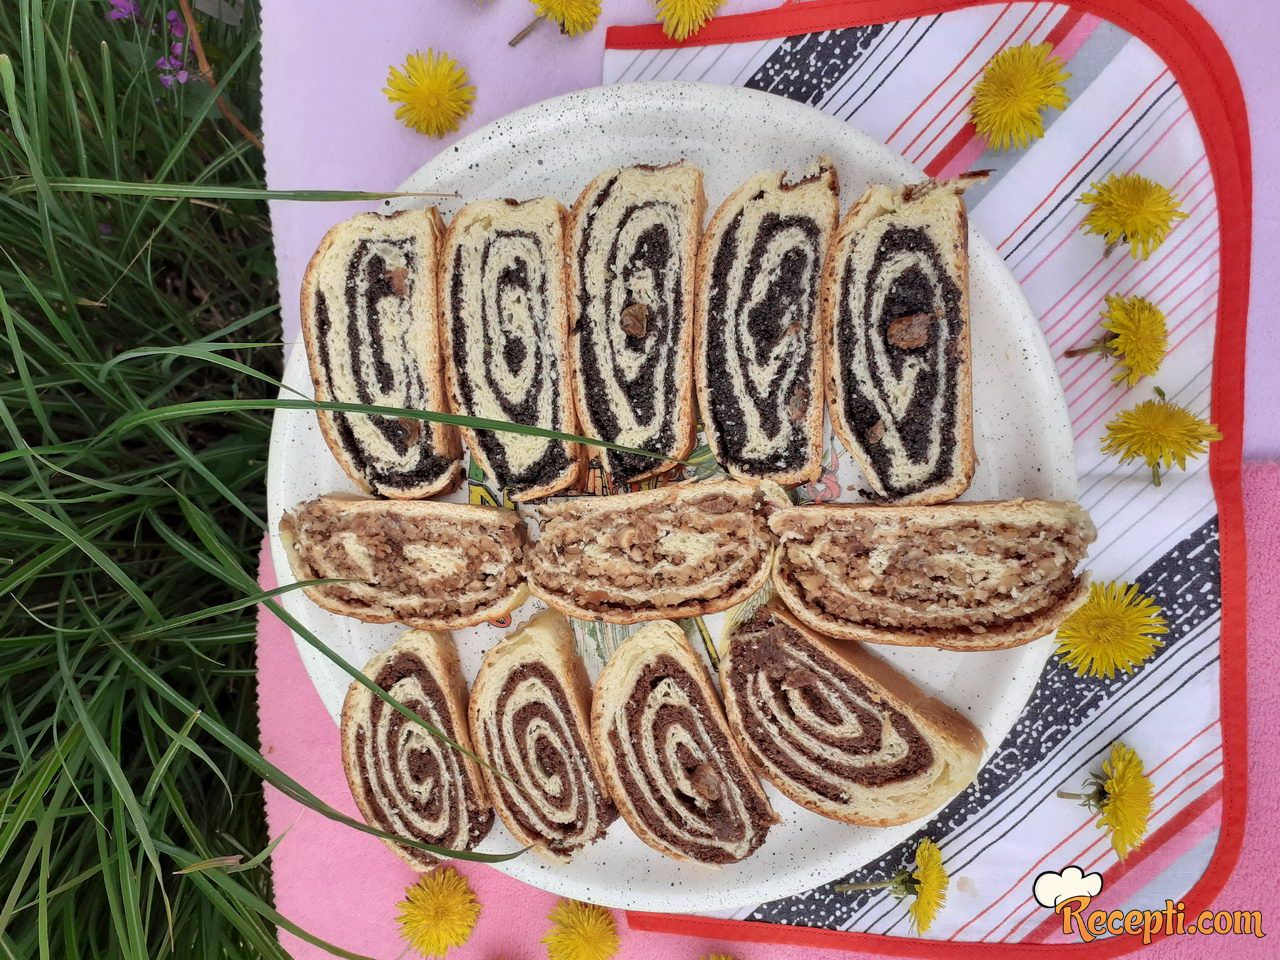 Štrudle (mak, lešnik, rogač, čokolada)